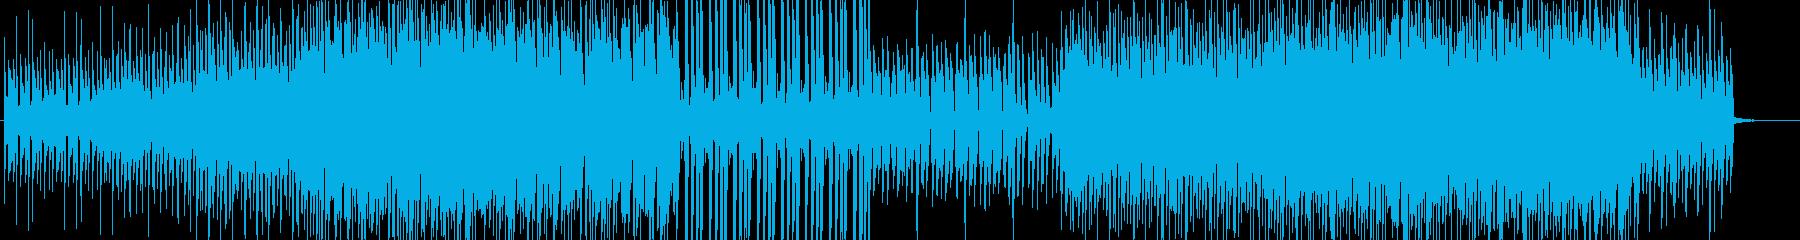 PV-星空★-ダンスポップ・エレクトロの再生済みの波形